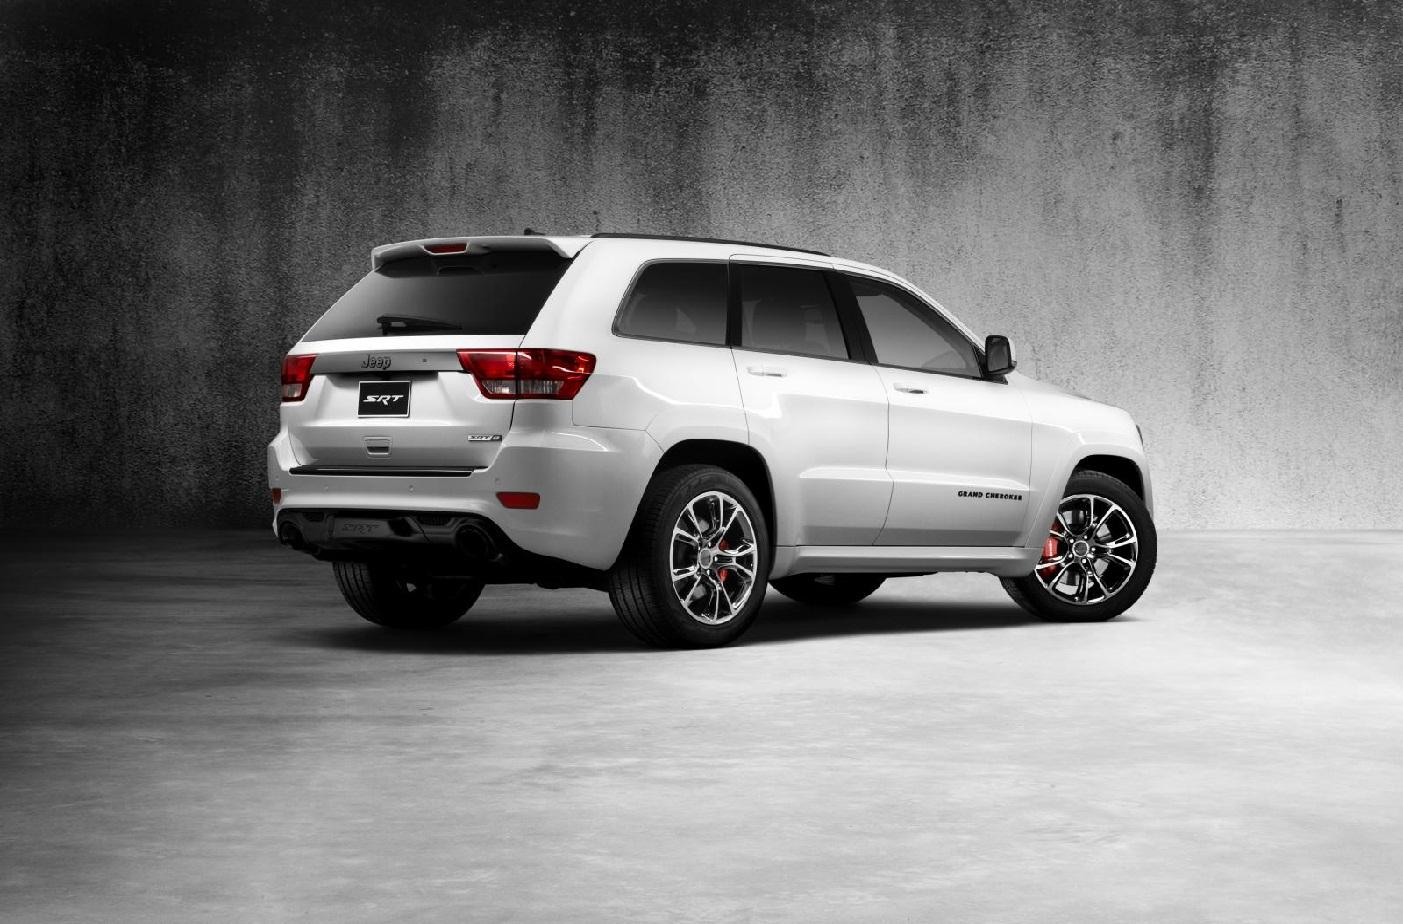 2013-Jeep-Grand-Cherokee-SRT8-Alpine-Edition-2